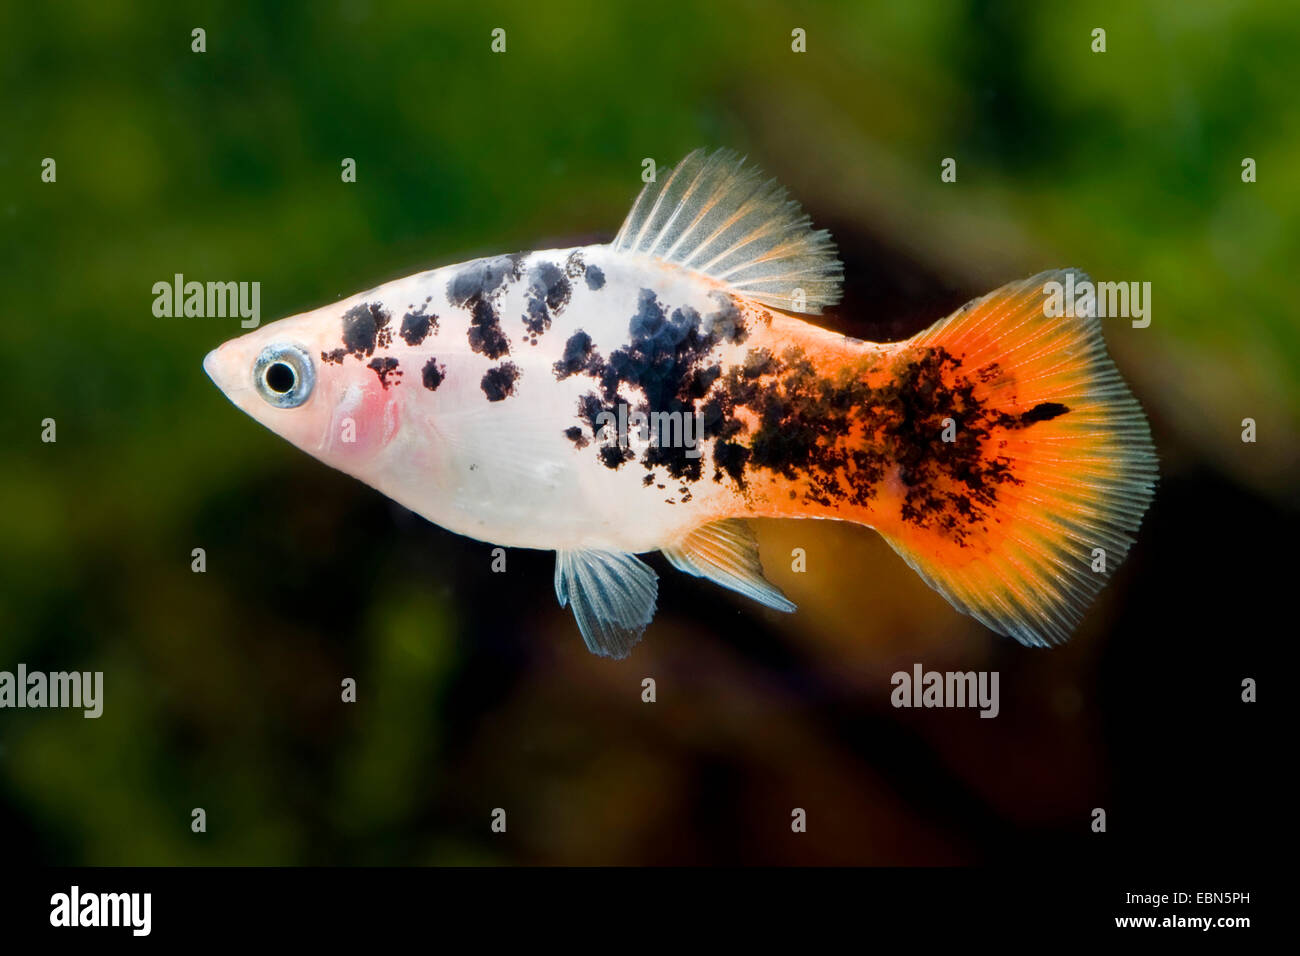 Southern Platyfish Maculate Platy Xiphophorus Maculatus